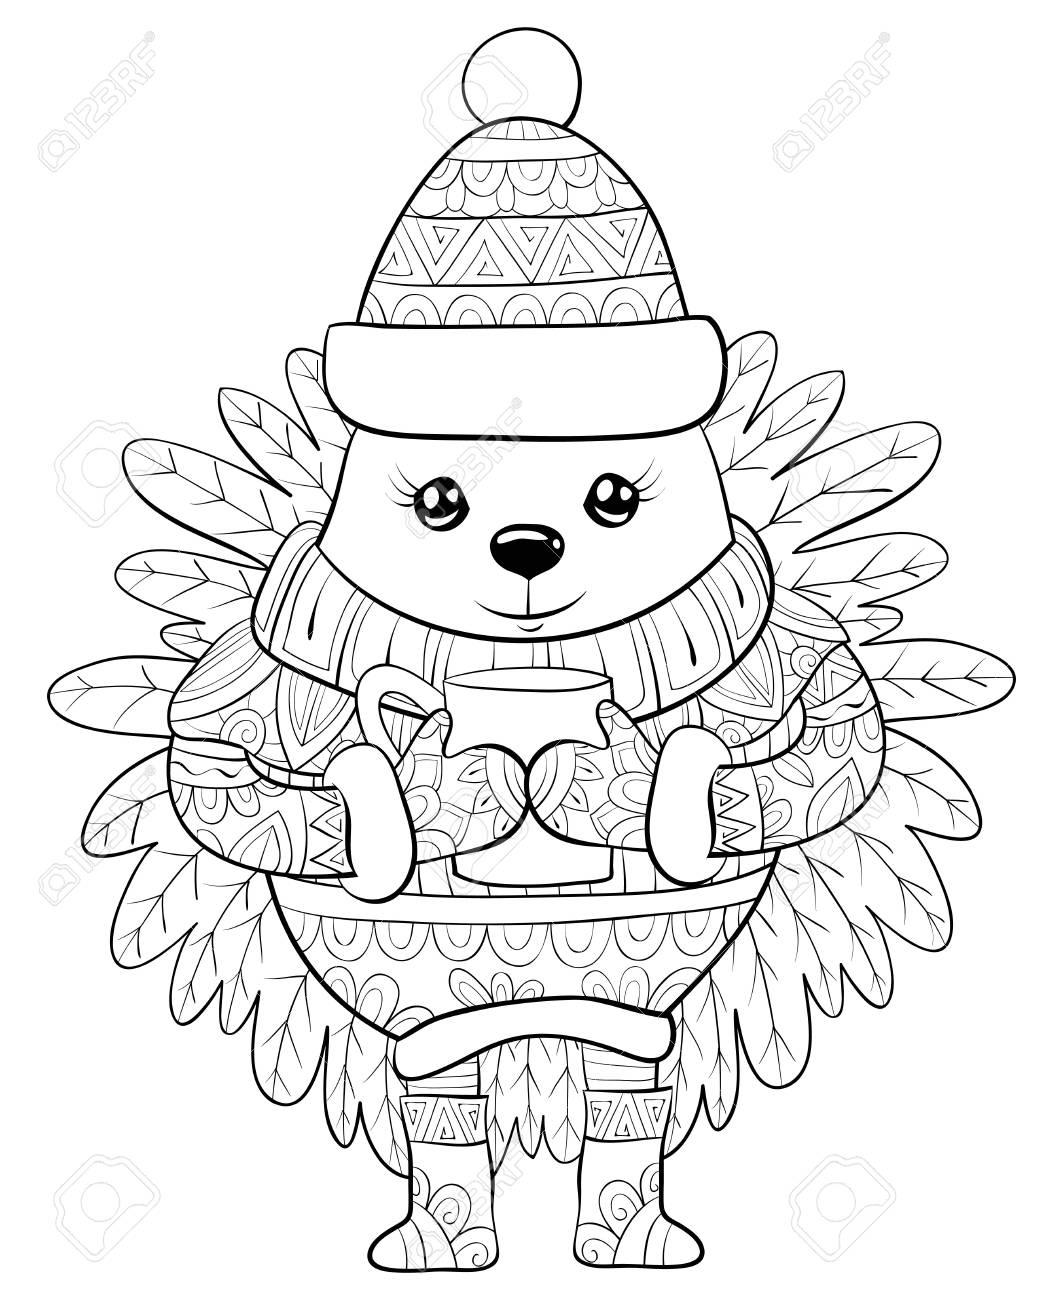 Christmas Boots Drawing.A Cute Cartoon Hedgehog Wearin A Christmas Cap Sweater Boots